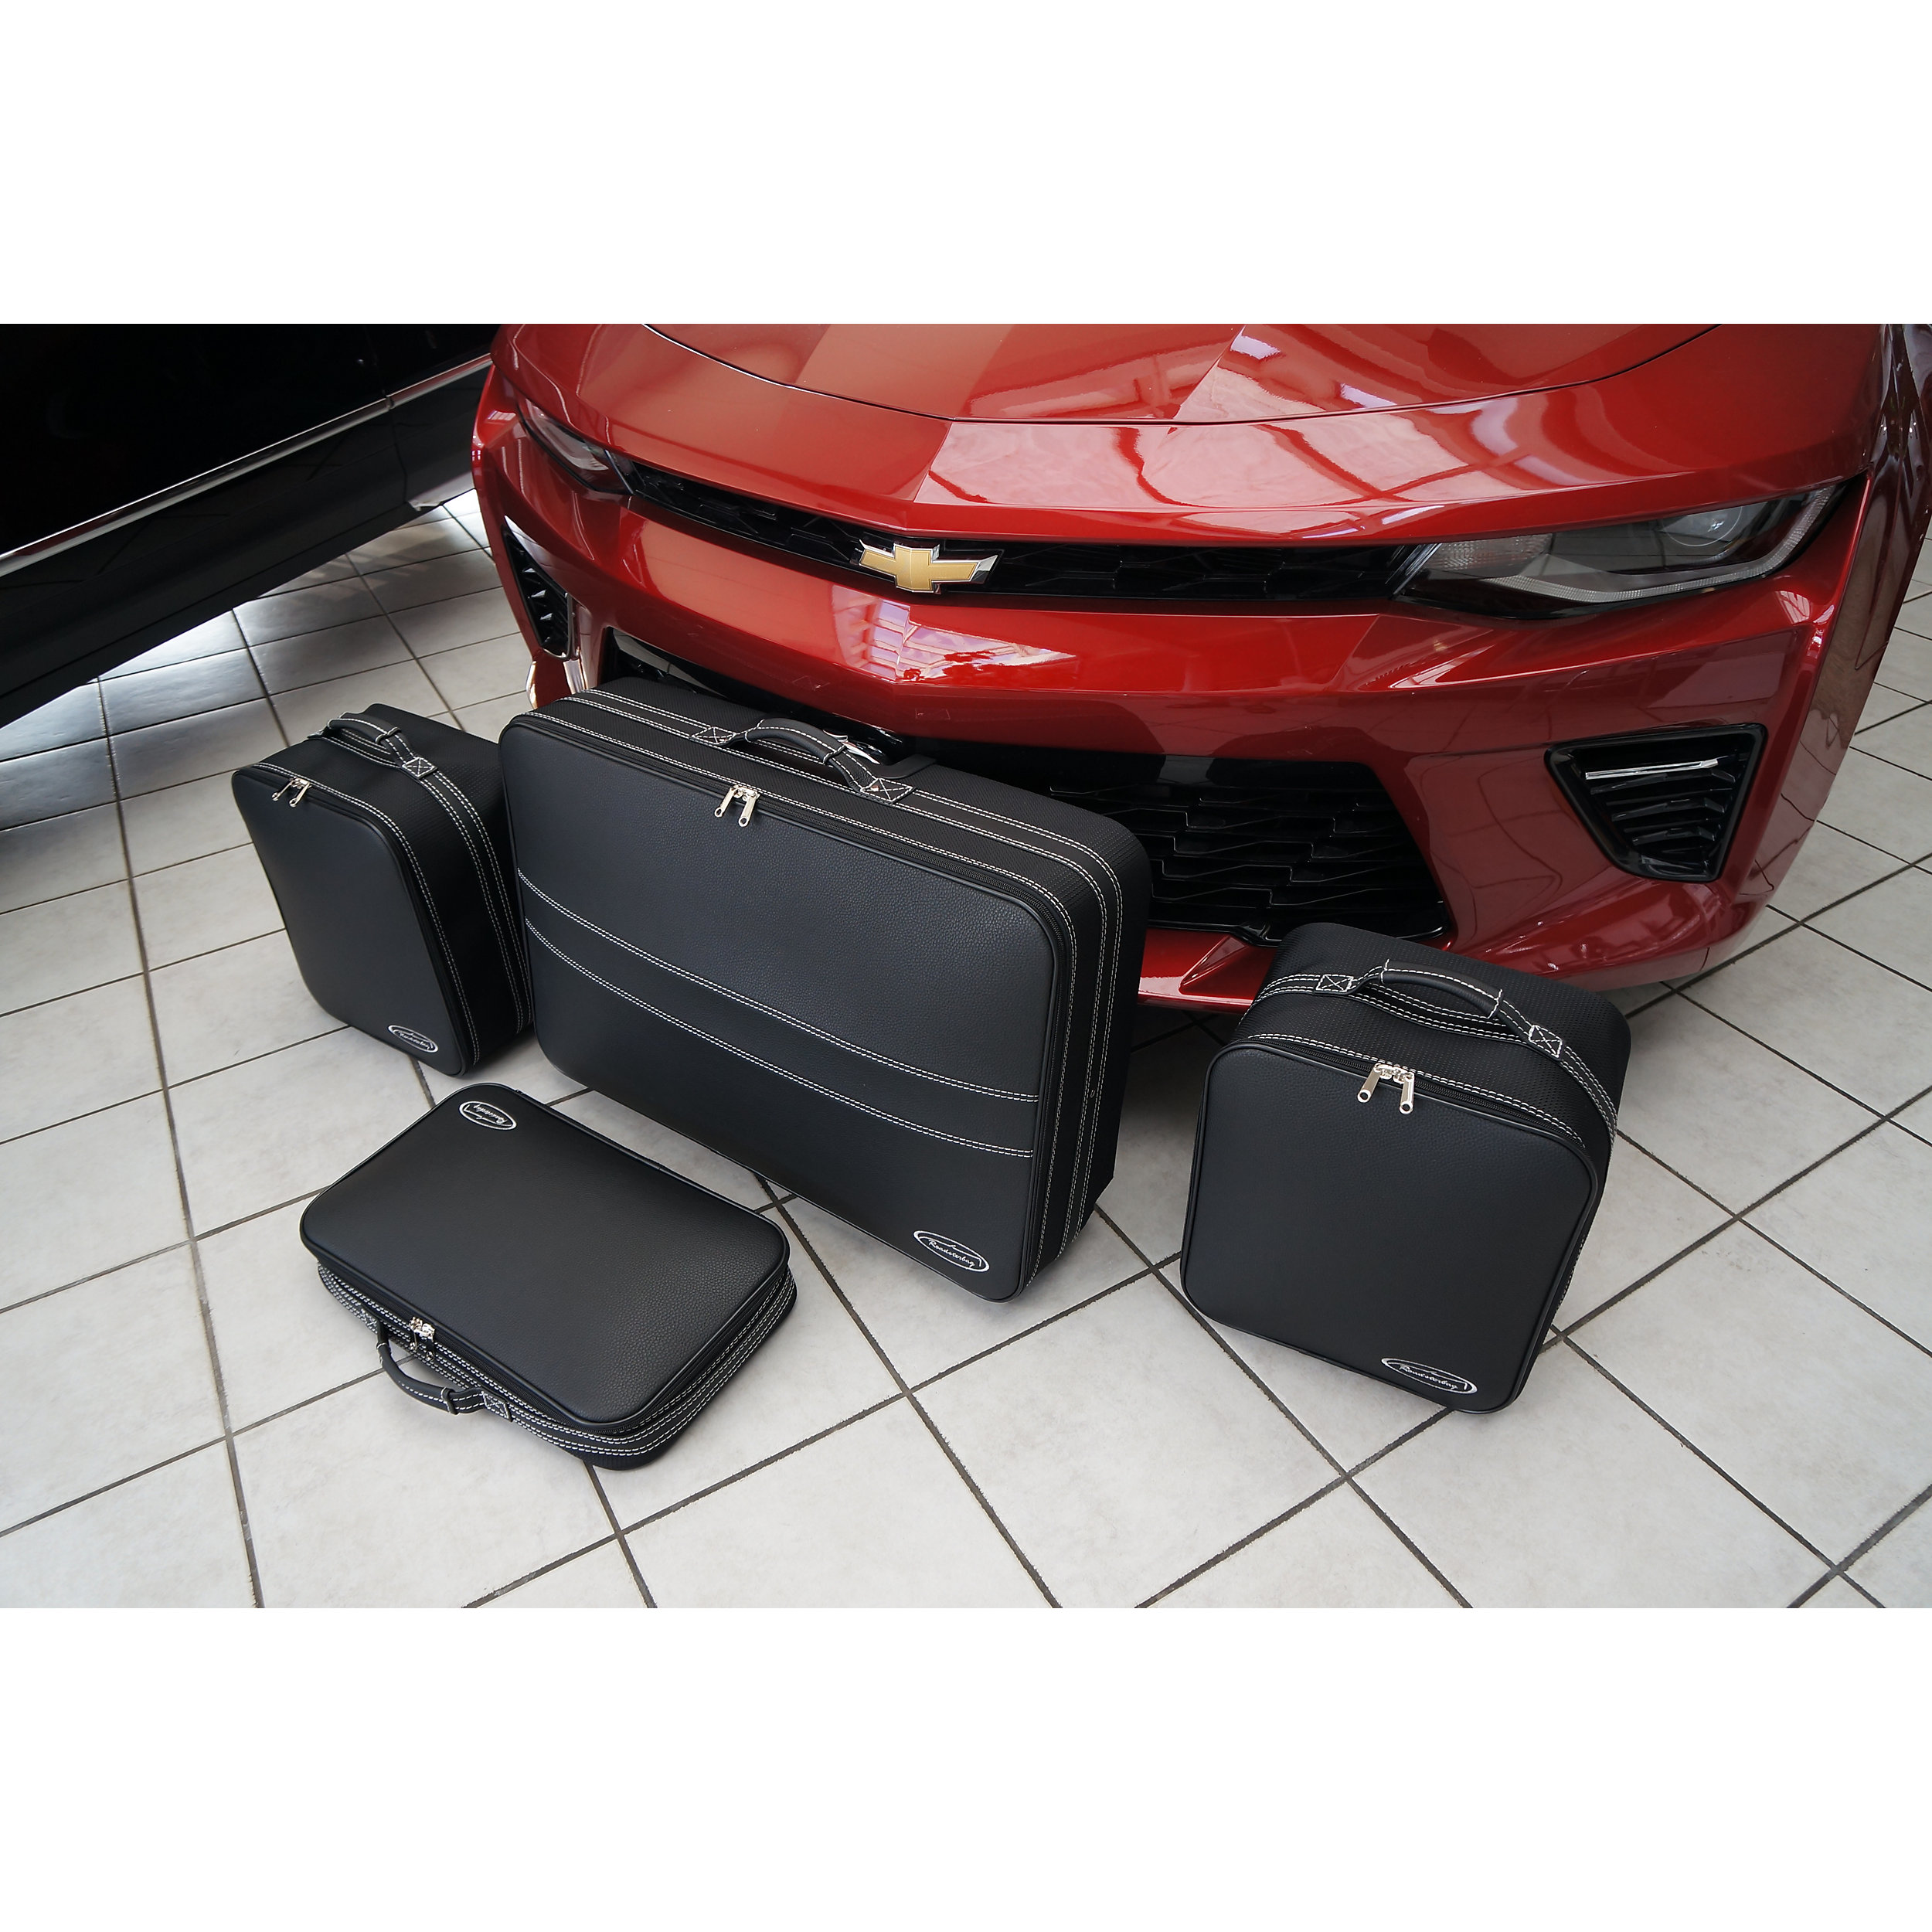 4-tlg. Kofferset Chevrolet Camaro Cabrio 127 Liter